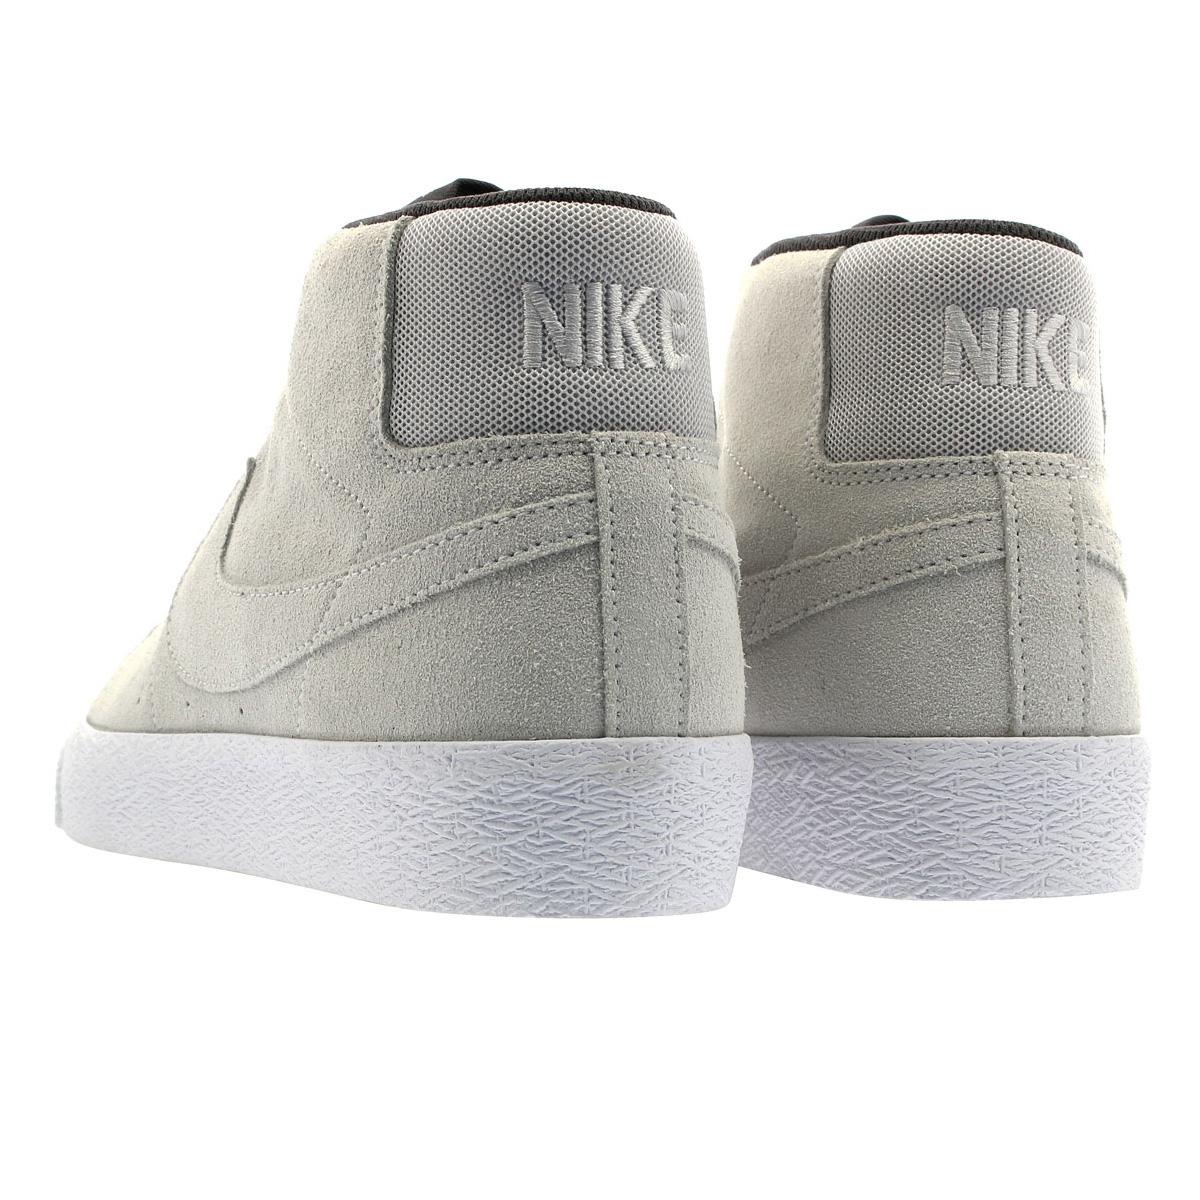 a57b2f749841f NIKE SB BLAZER ZOOM MID Nike SB blazer zoom mid VAST GREY VAST GREY THUNDER  GREY 864